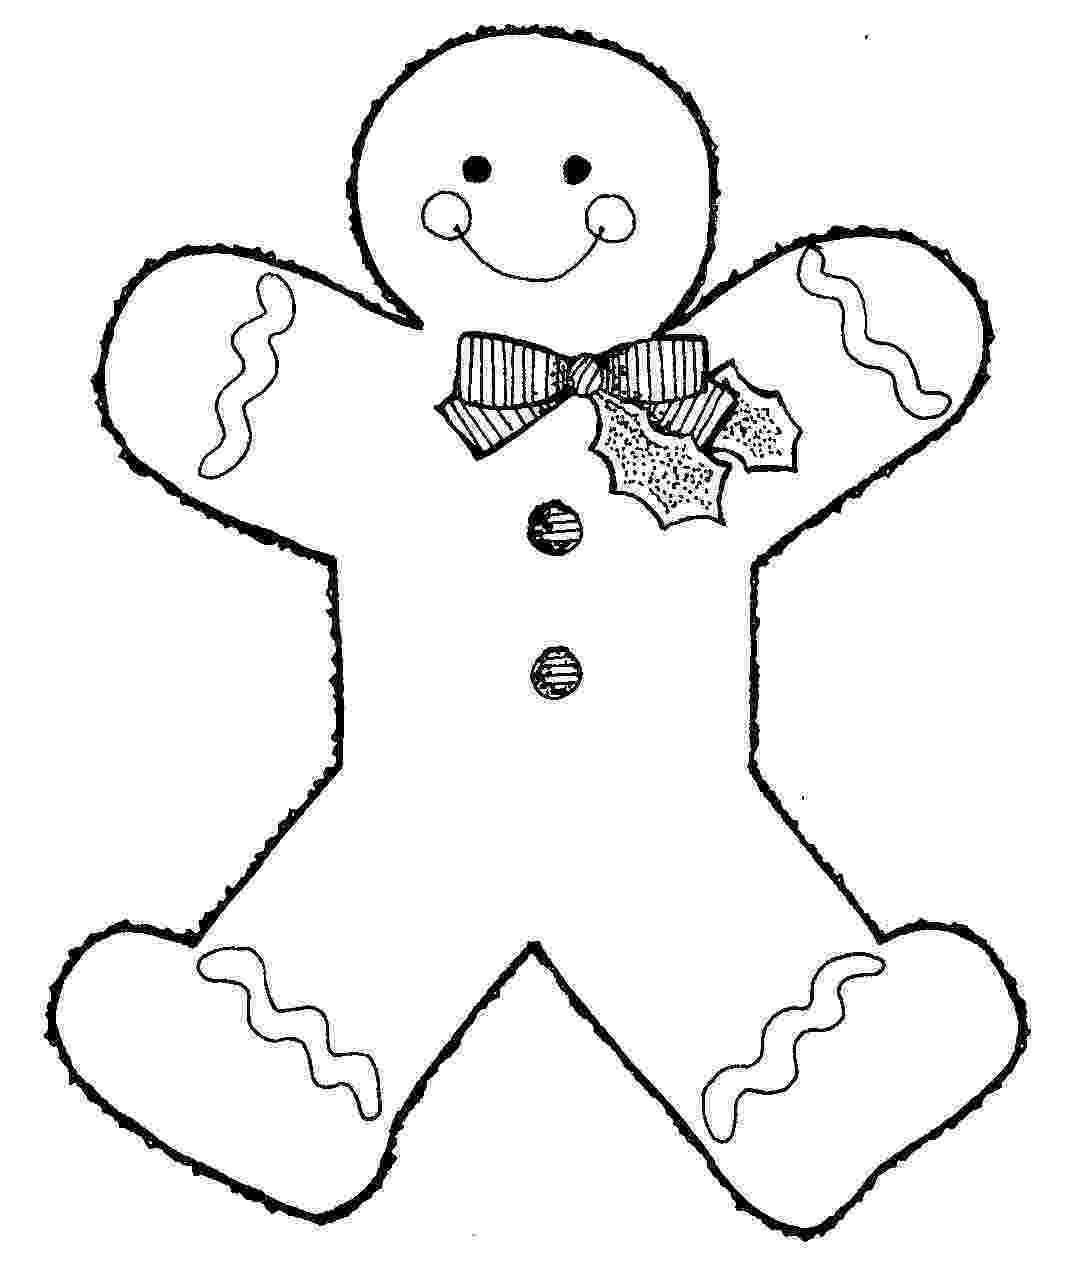 gingerbread man color sheet free printable gingerbread man coloring pages for kids color man gingerbread sheet 1 1